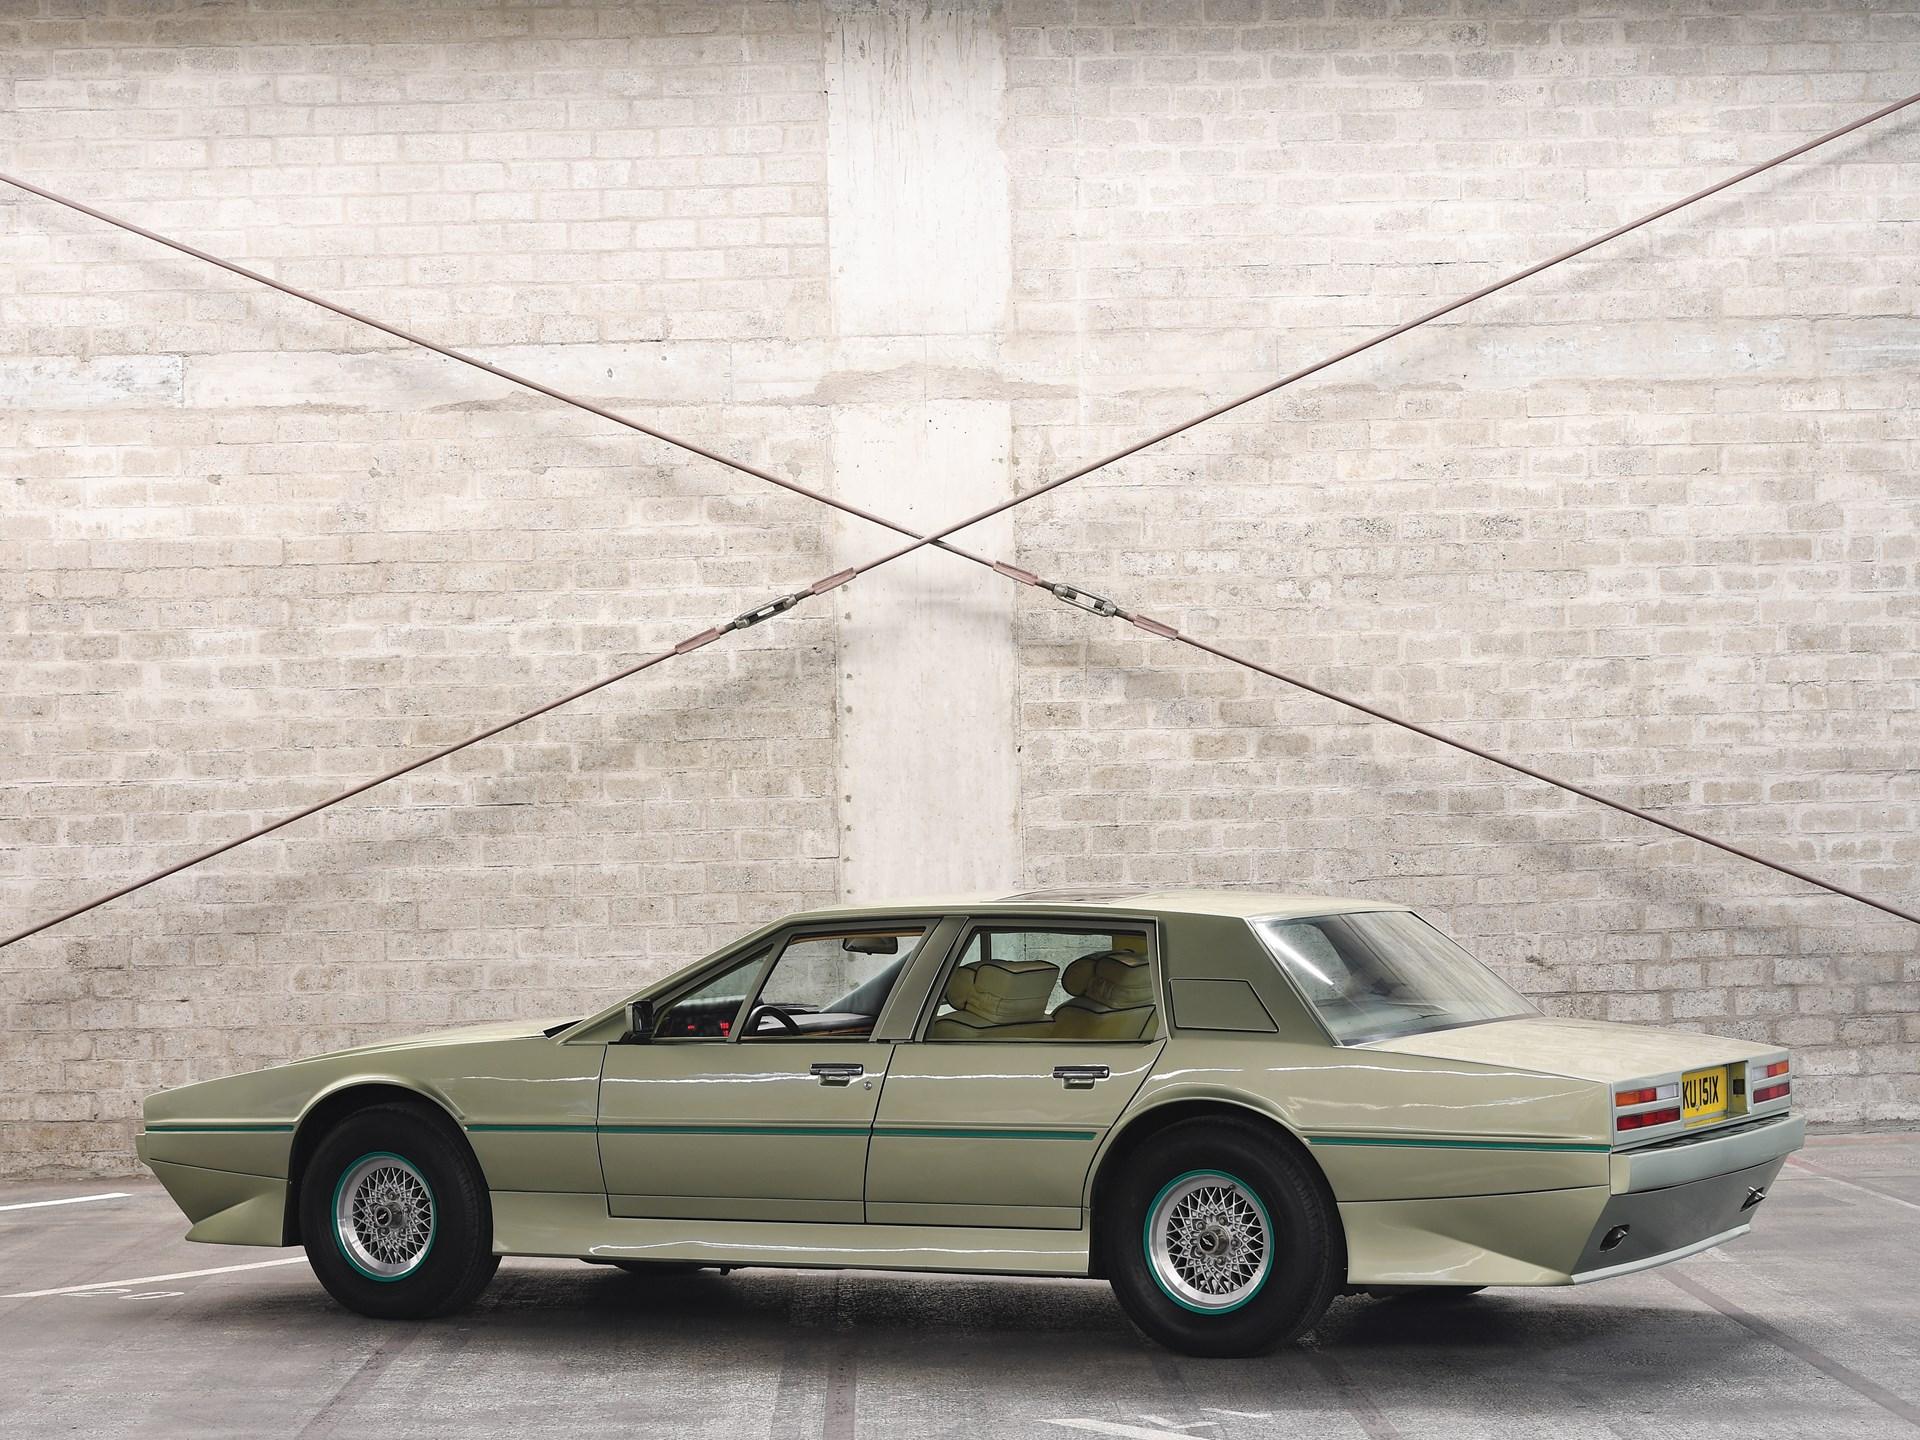 1983 Aston Martin Tickford Lagonda 3/4 rear